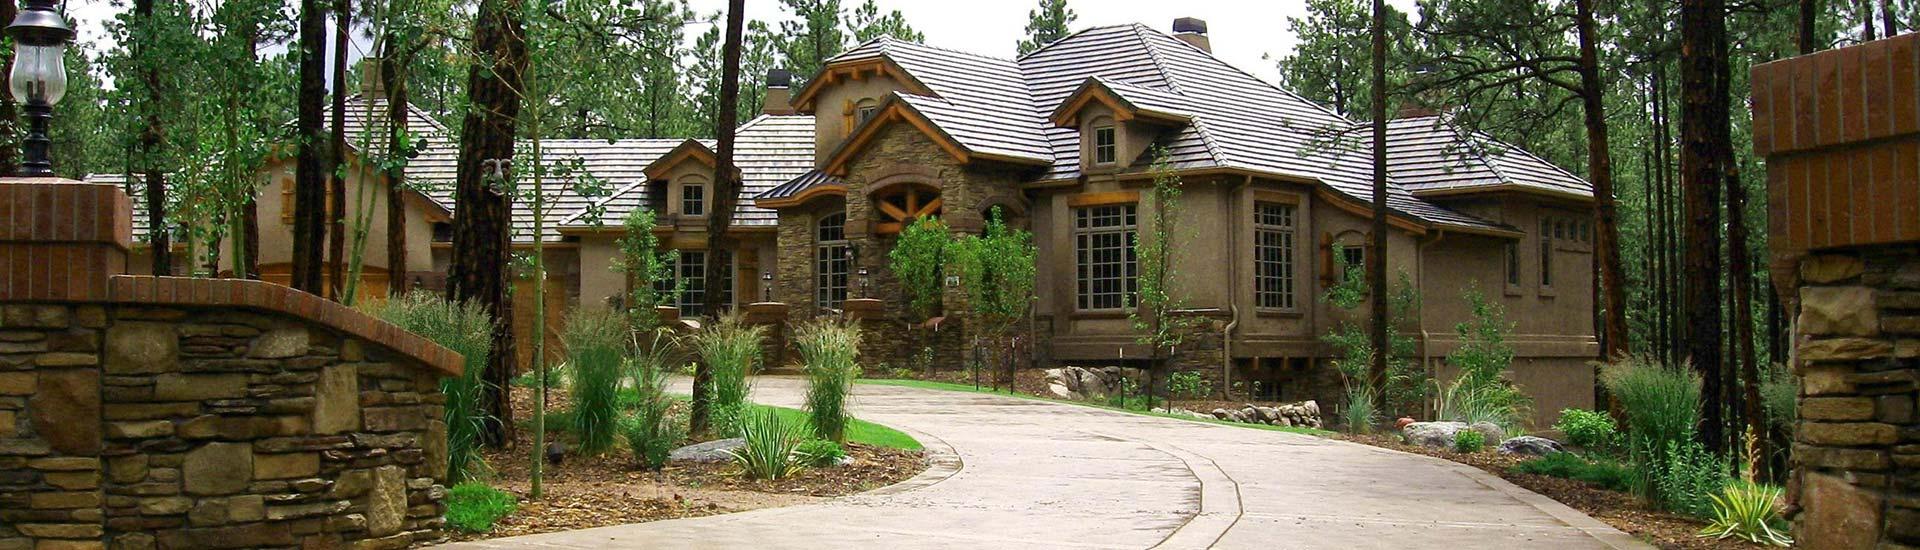 Custom Home Designs In Colorado Springs, CO